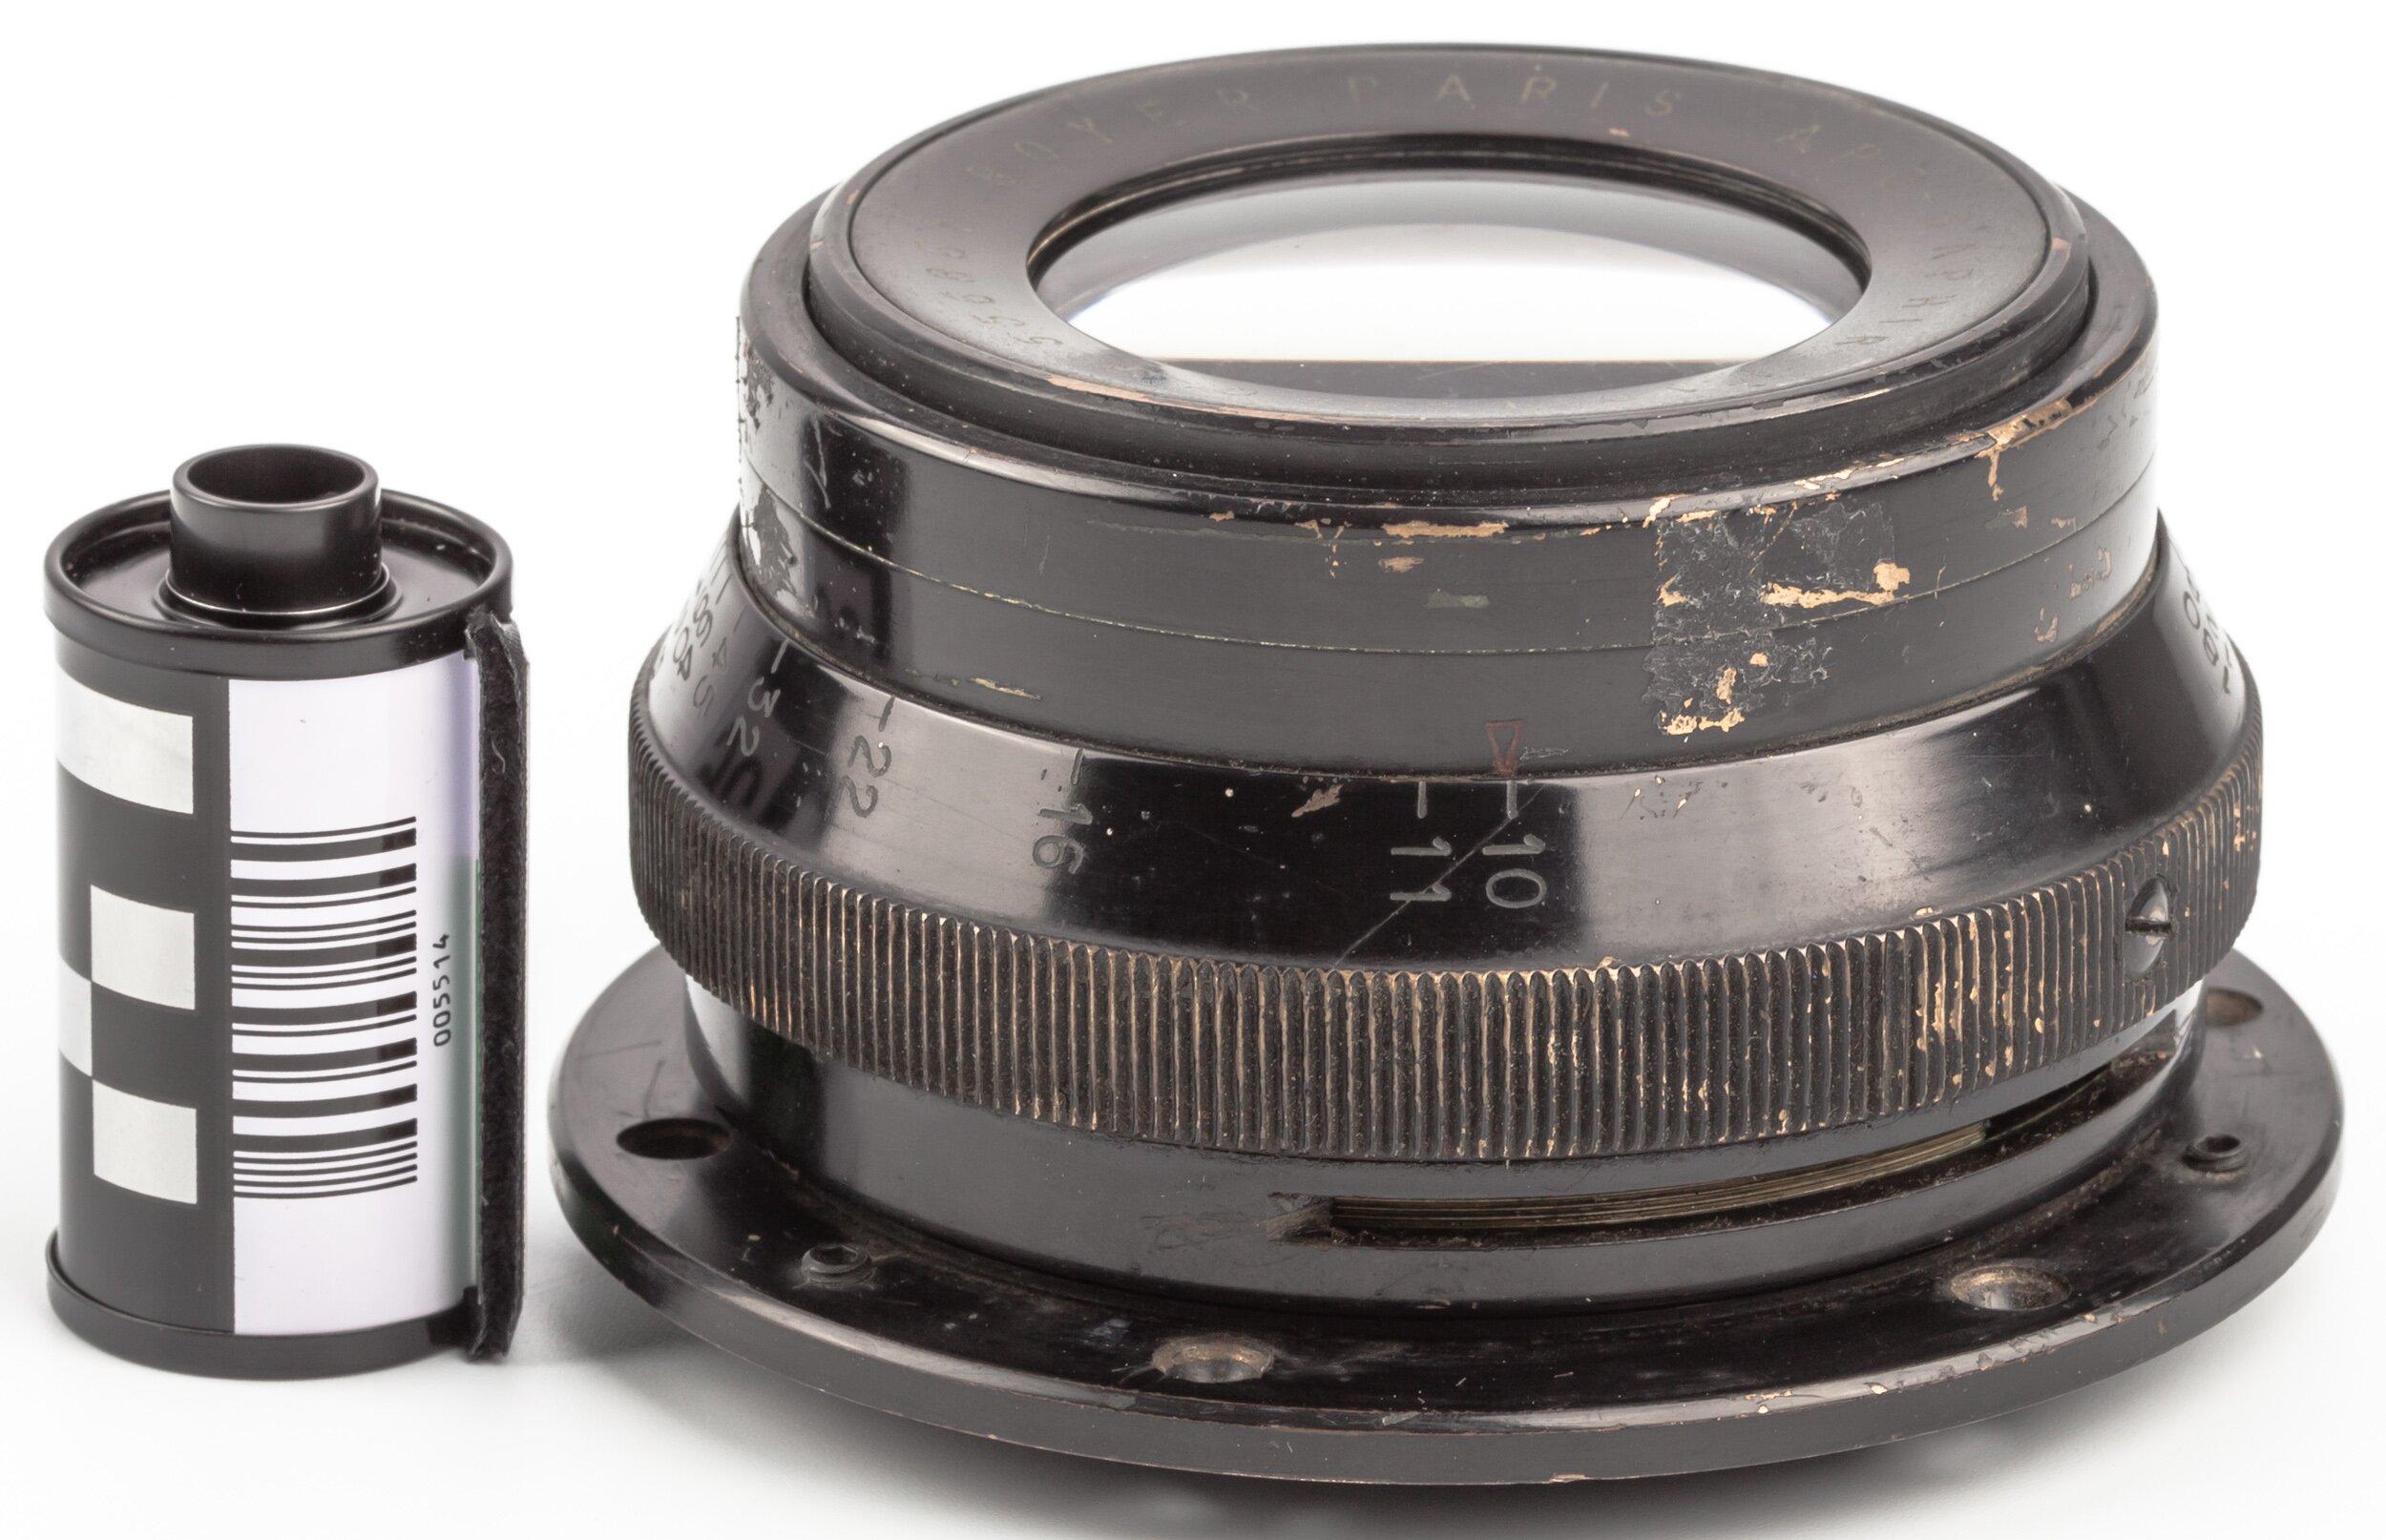 Boyer 10/450mm Apo-Saphir